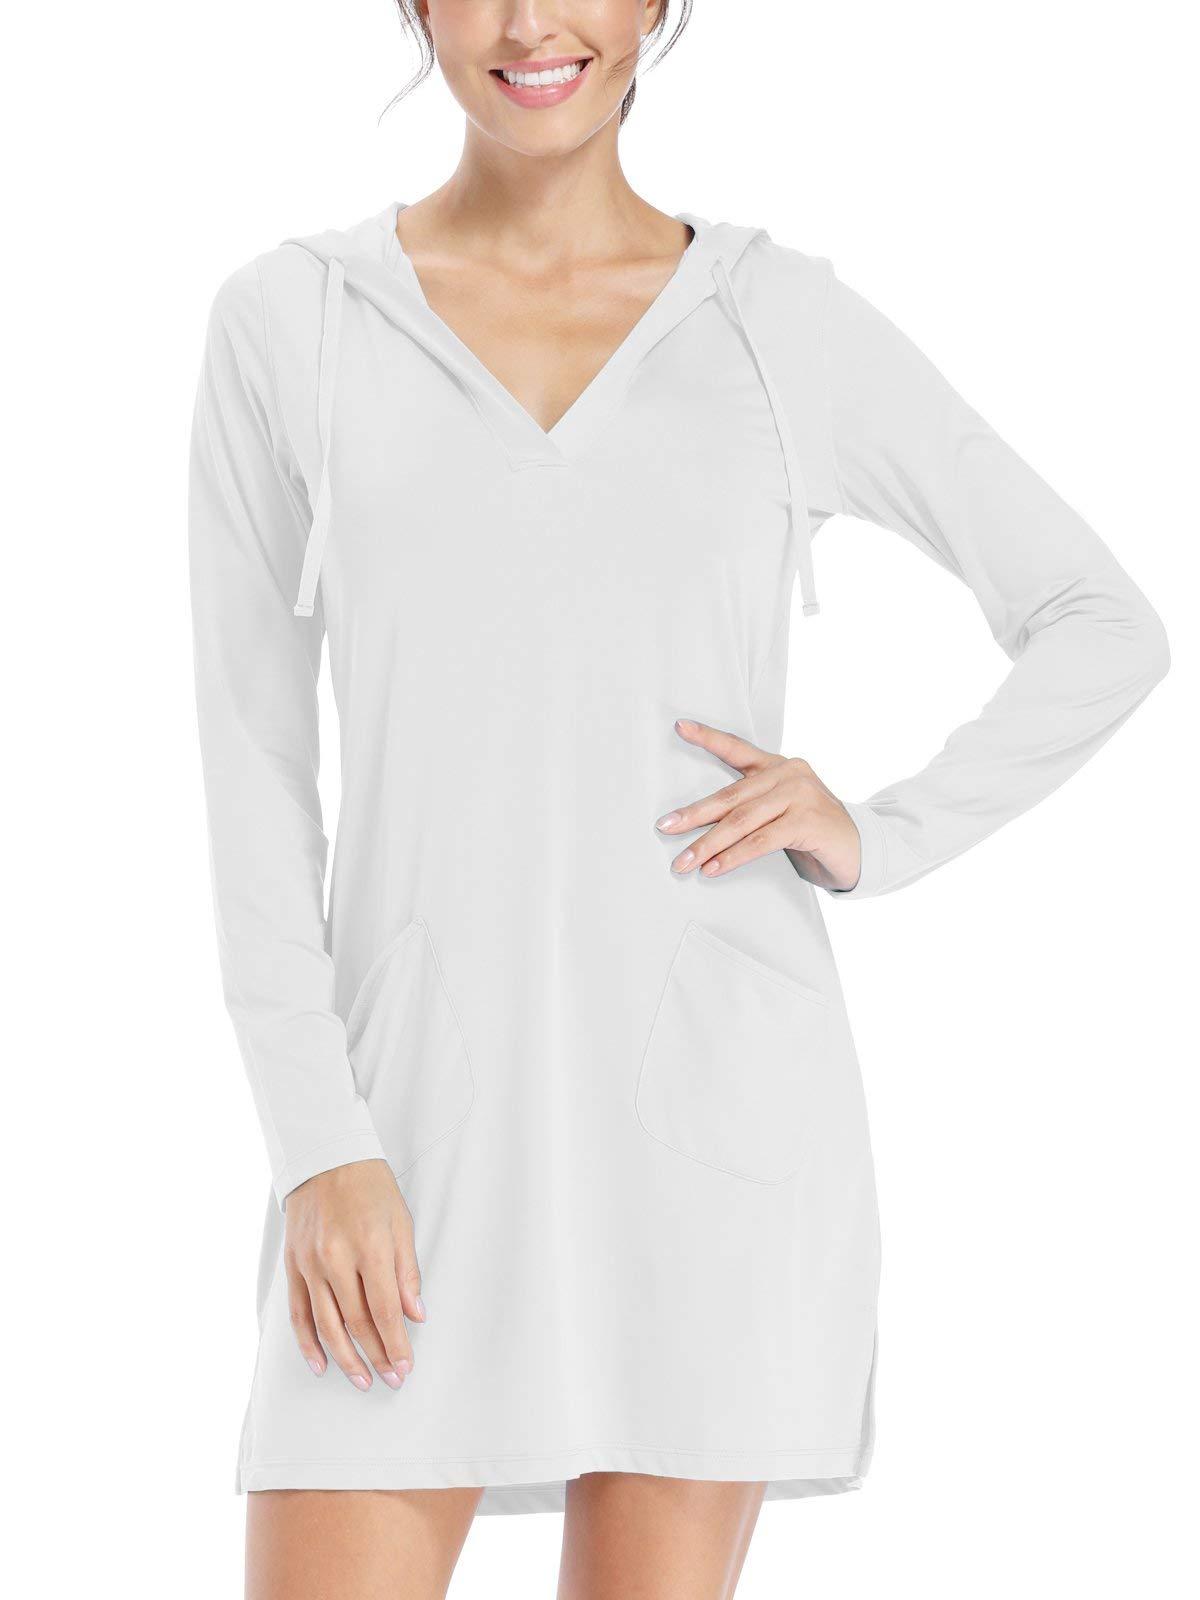 Willit Women's UPF 50+ Cover-Up Dress Beach SPF Long Sleeve Shirt Dress Sun Protection Hiking Beach